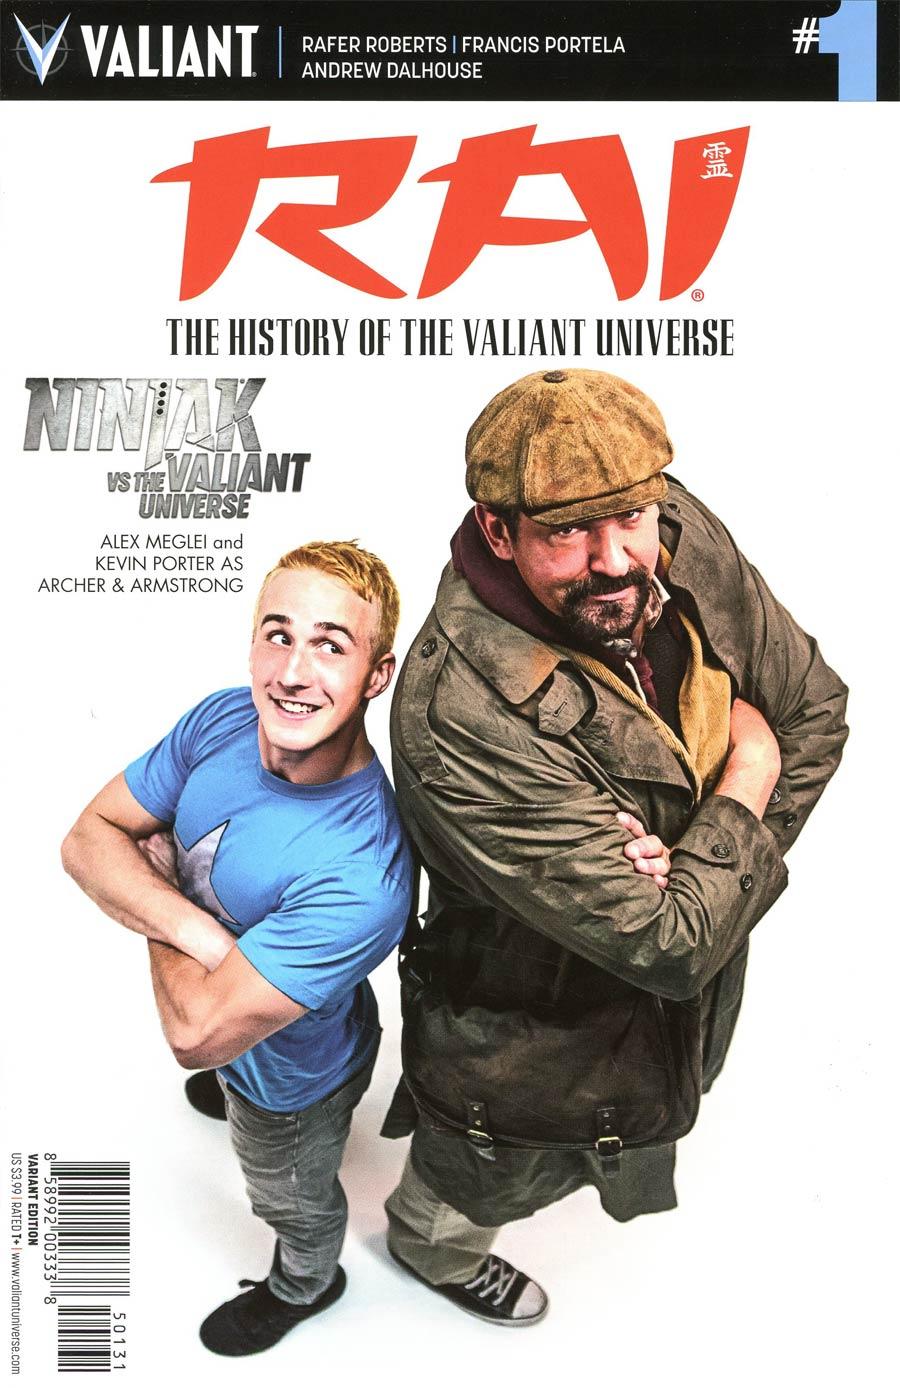 Rai History Of The Valiant Universe #1 Cover C Variant Ninjak vs The Valiant Universe Cover